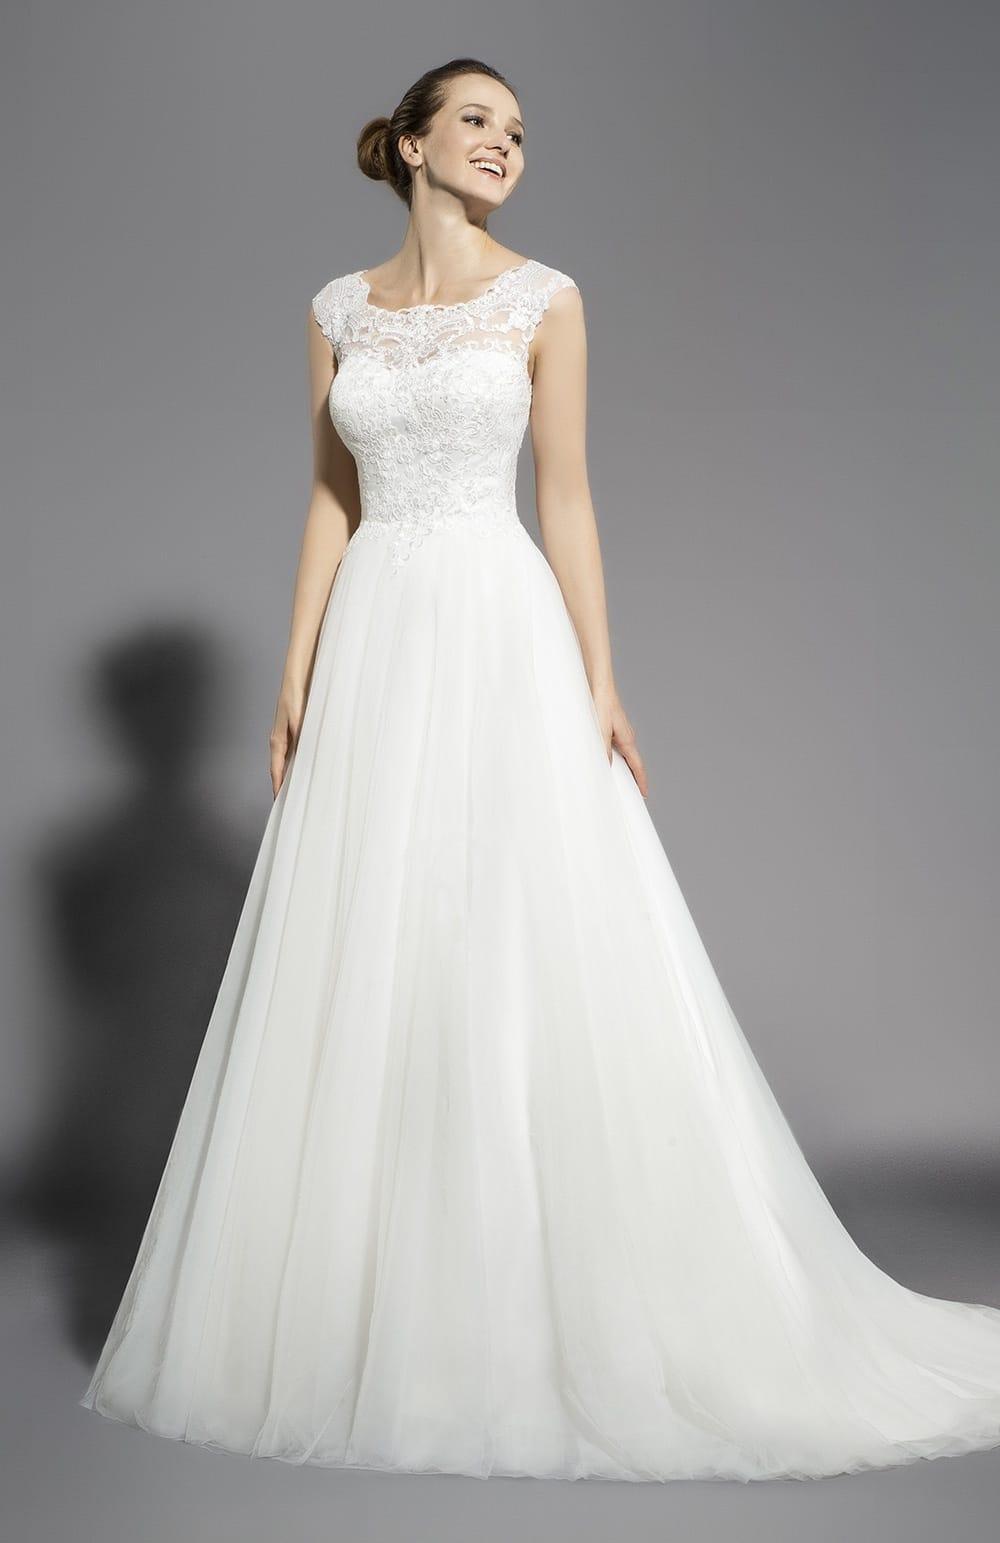 Robe de mariée Modèle Pearl